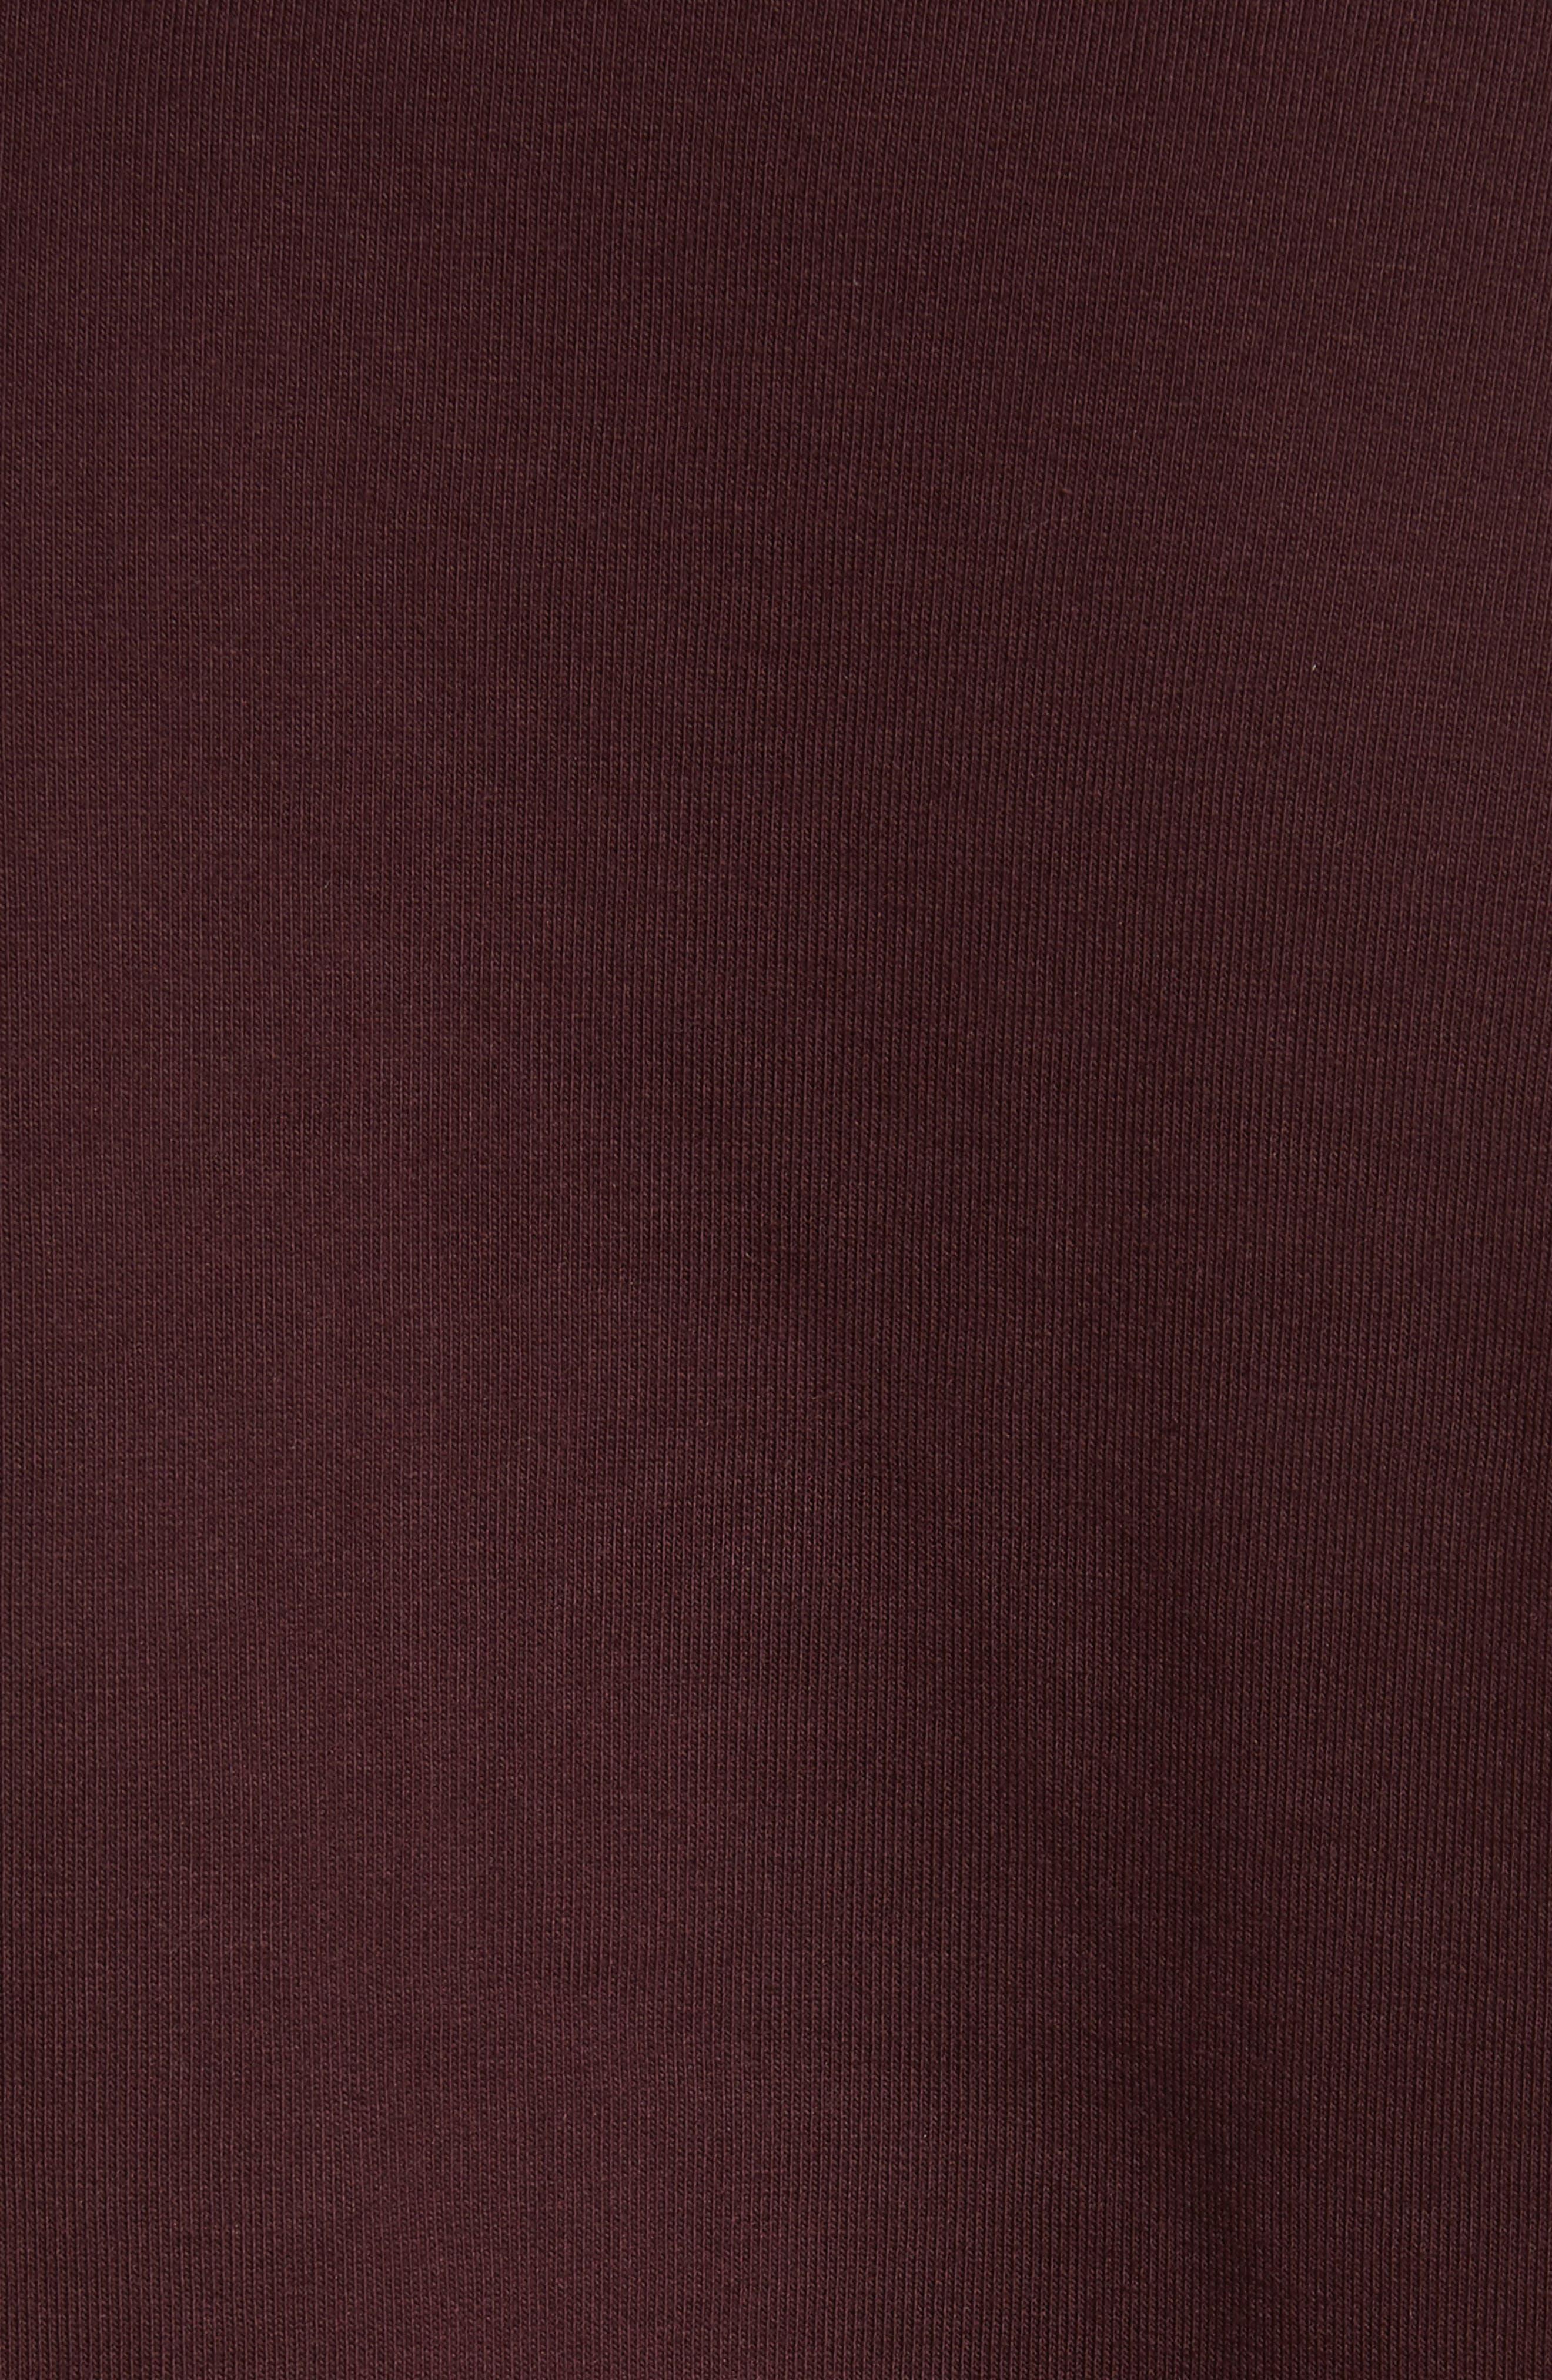 Crewneck Sweatshirt,                             Alternate thumbnail 5, color,                             930